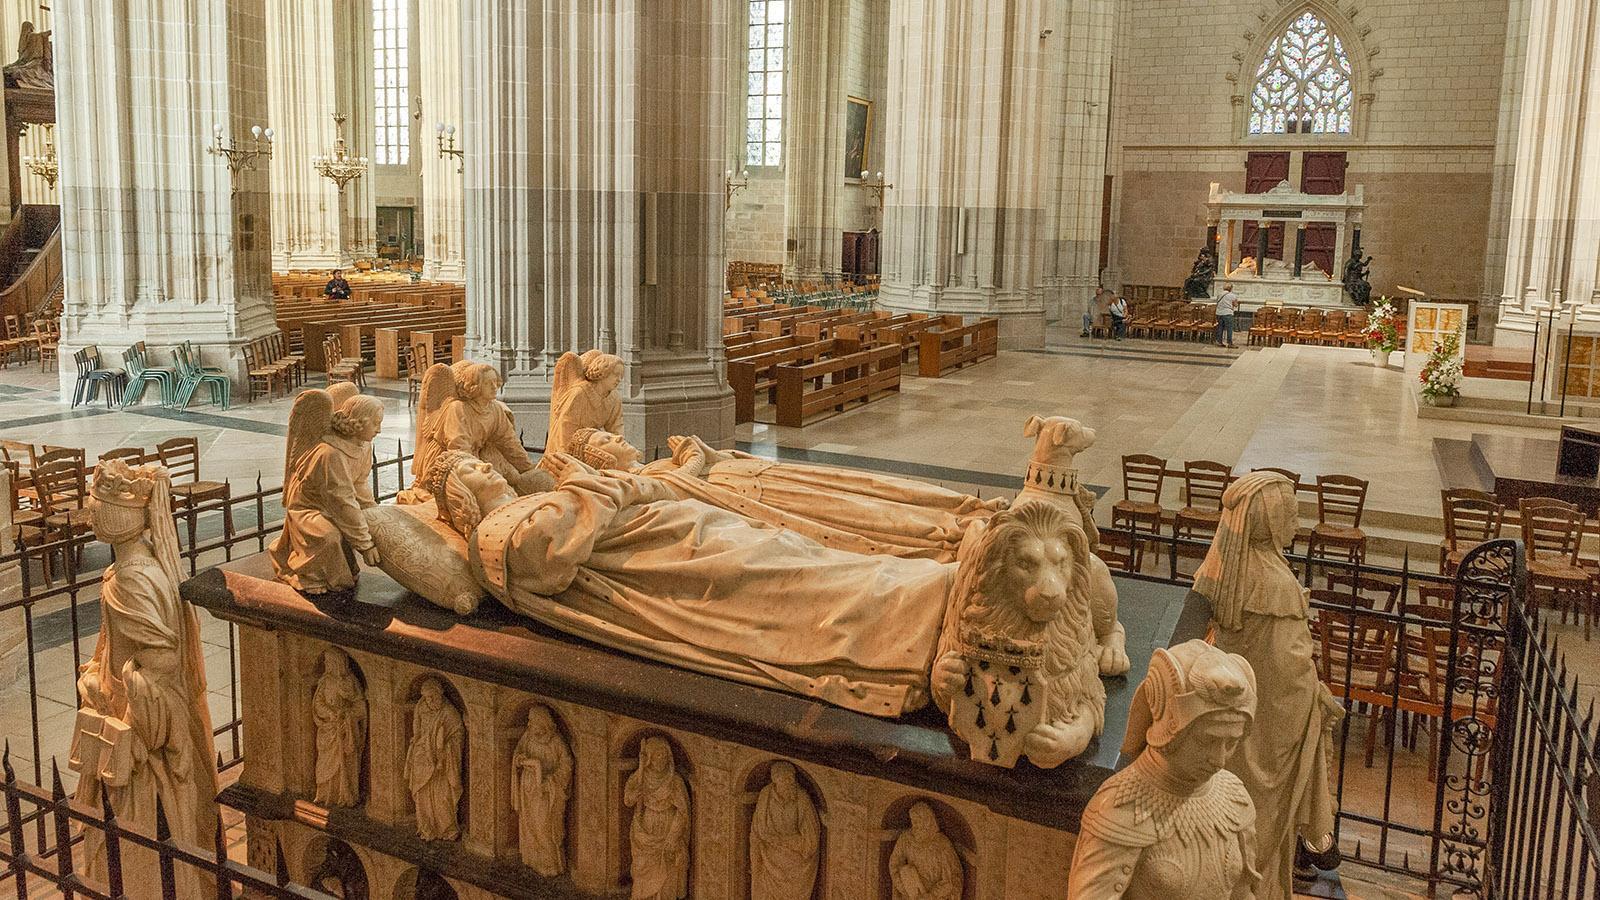 Nantes: Herzogsgrab in der Kathedrale. Foto: Hike Maunder